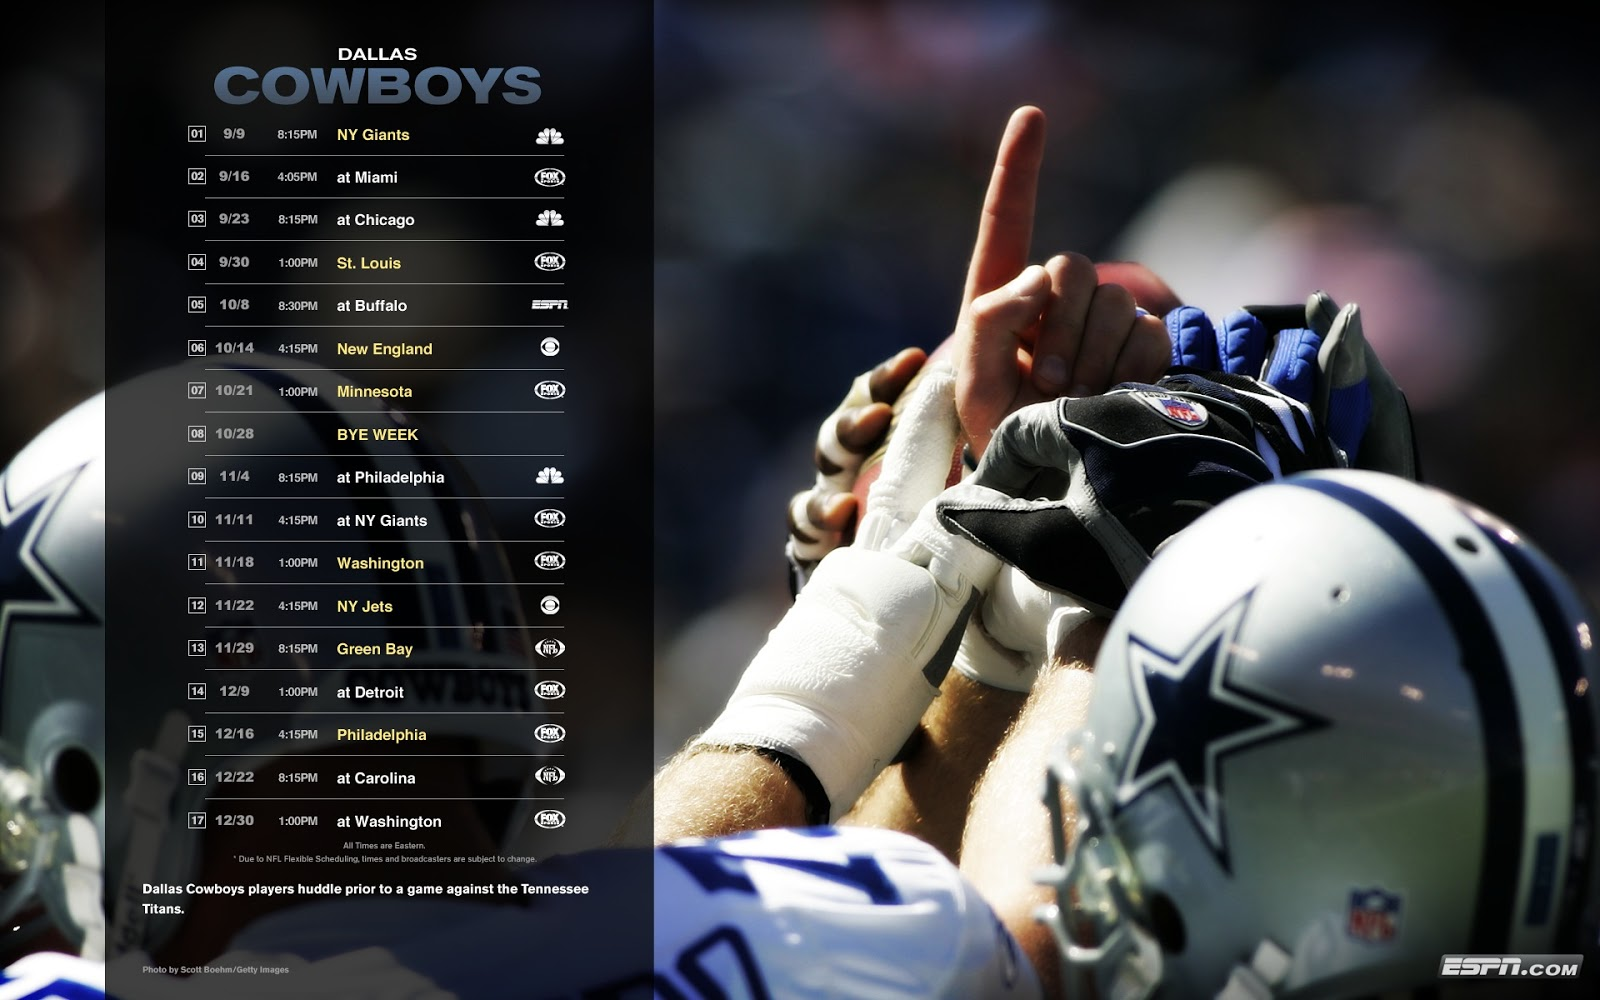 Dallas Cowboys HD Wallpapers Dallas Cowboys HD Wallpapers Check out 1600x1000